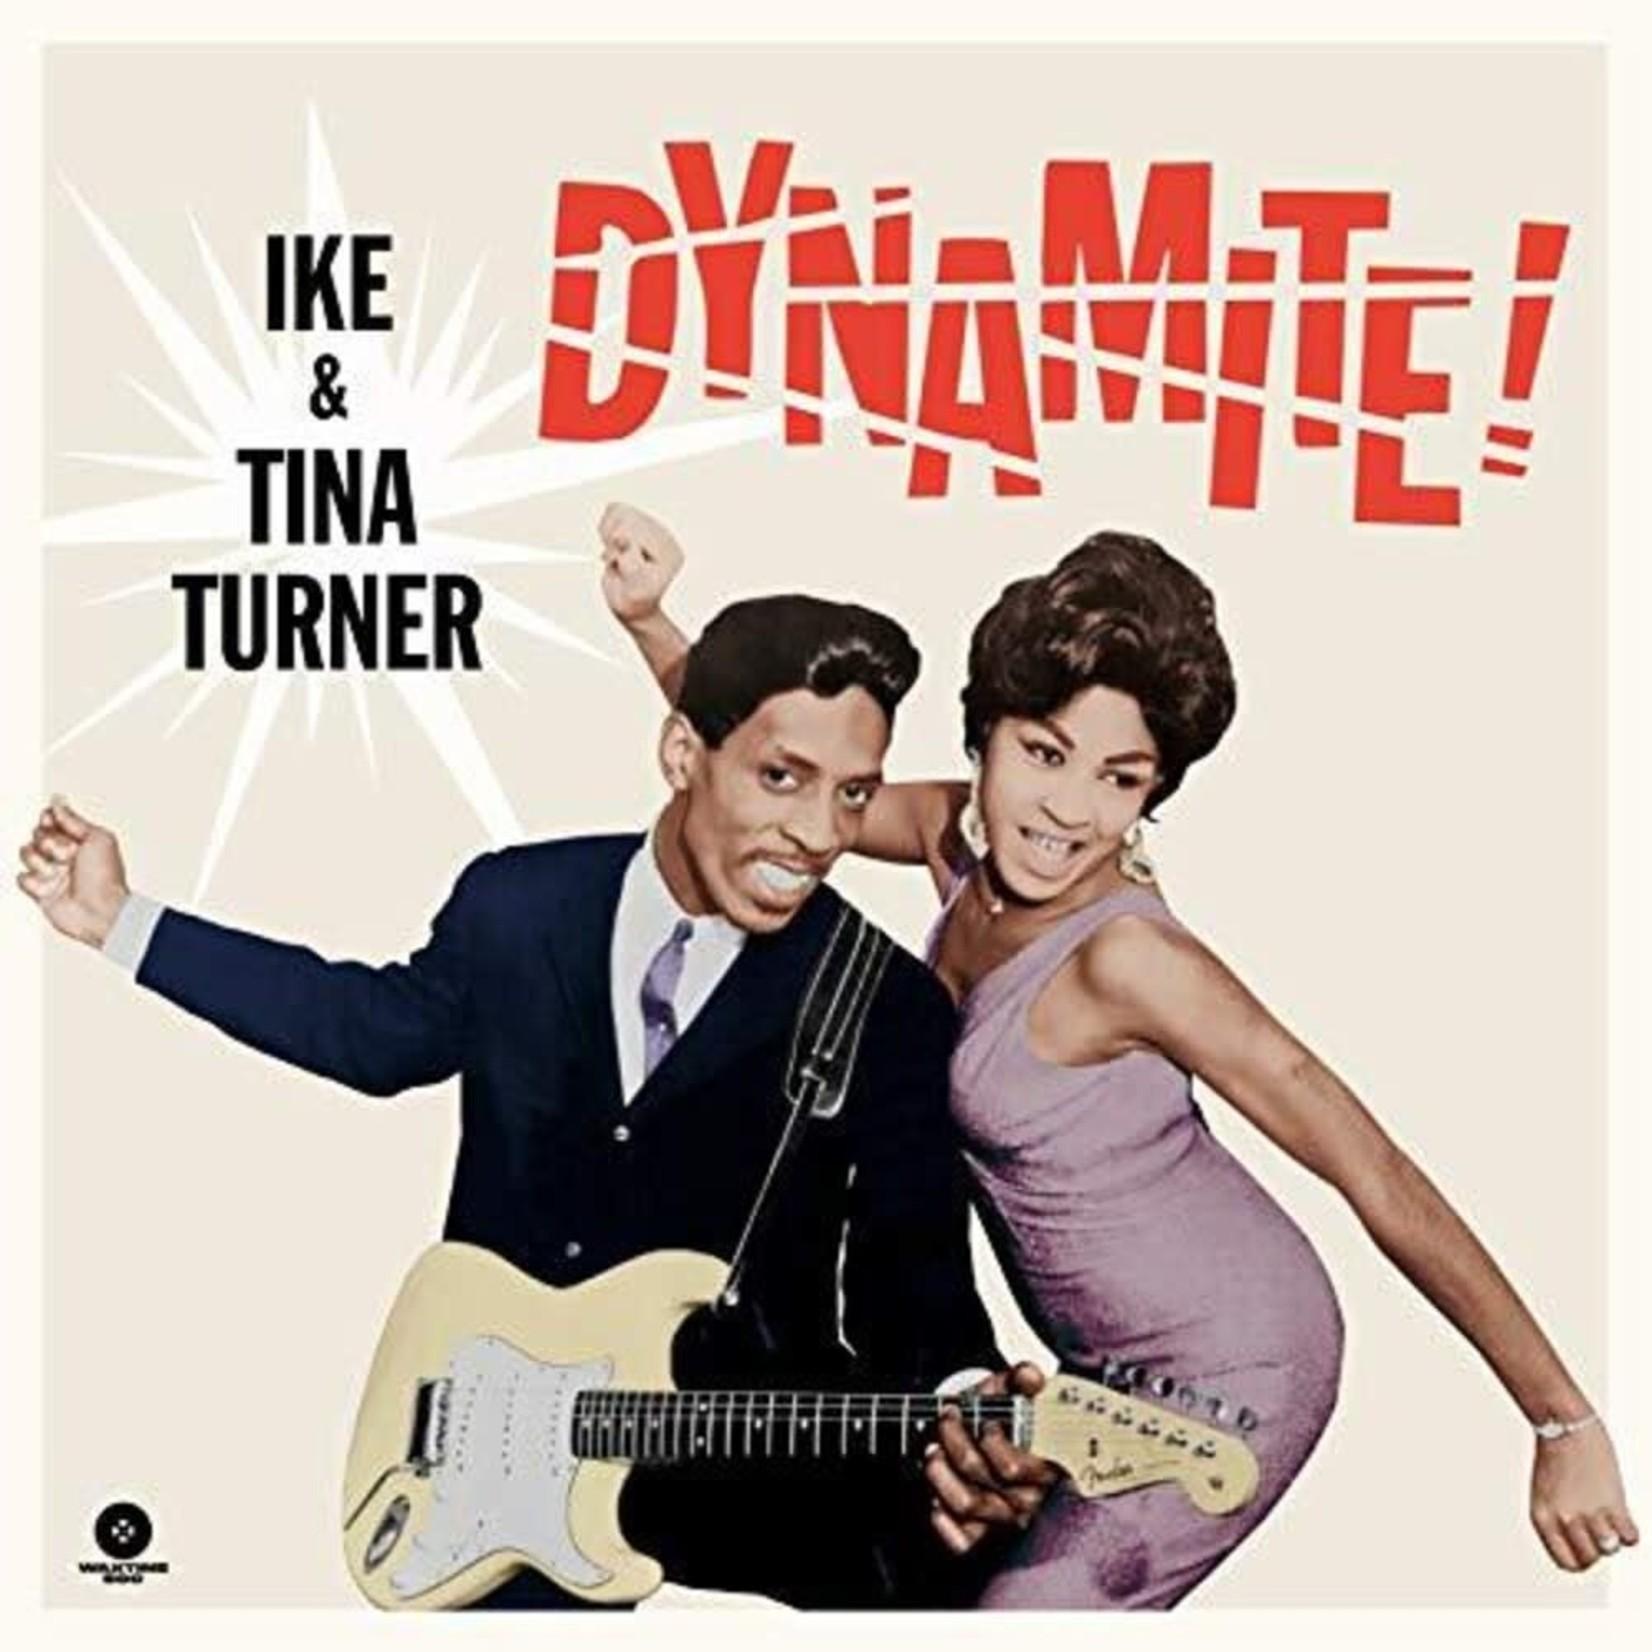 IKE & TINA TURNER DYNAMITE!  LTD EDITION 180g AUDIOPHILE PRESSING